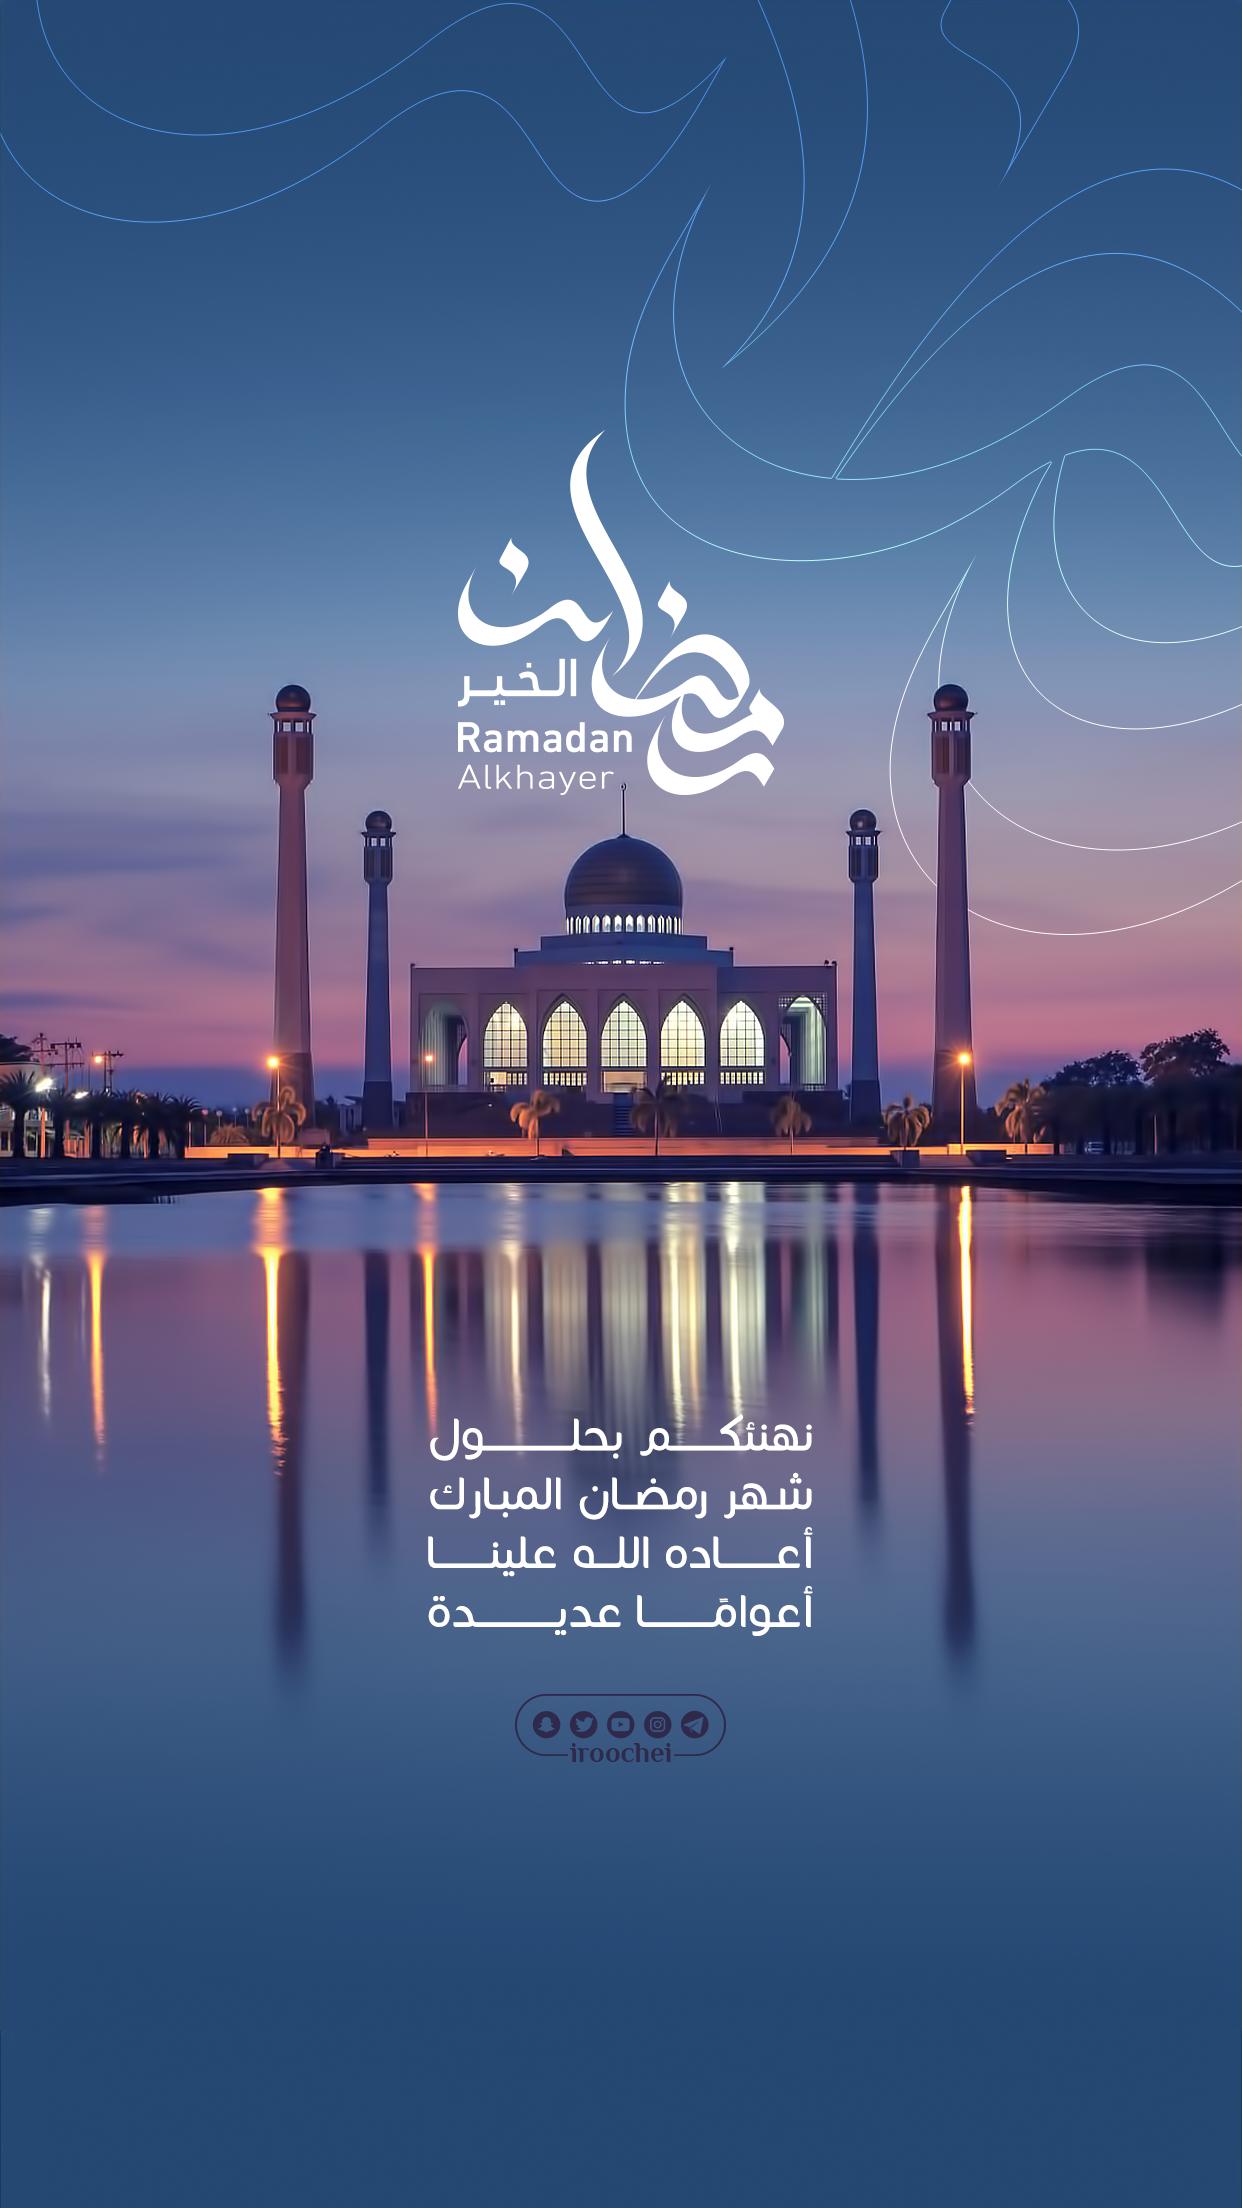 تهنئة بحلول شهر رمضان Ramadan Kareem Pictures Ramadan Ramadan Images